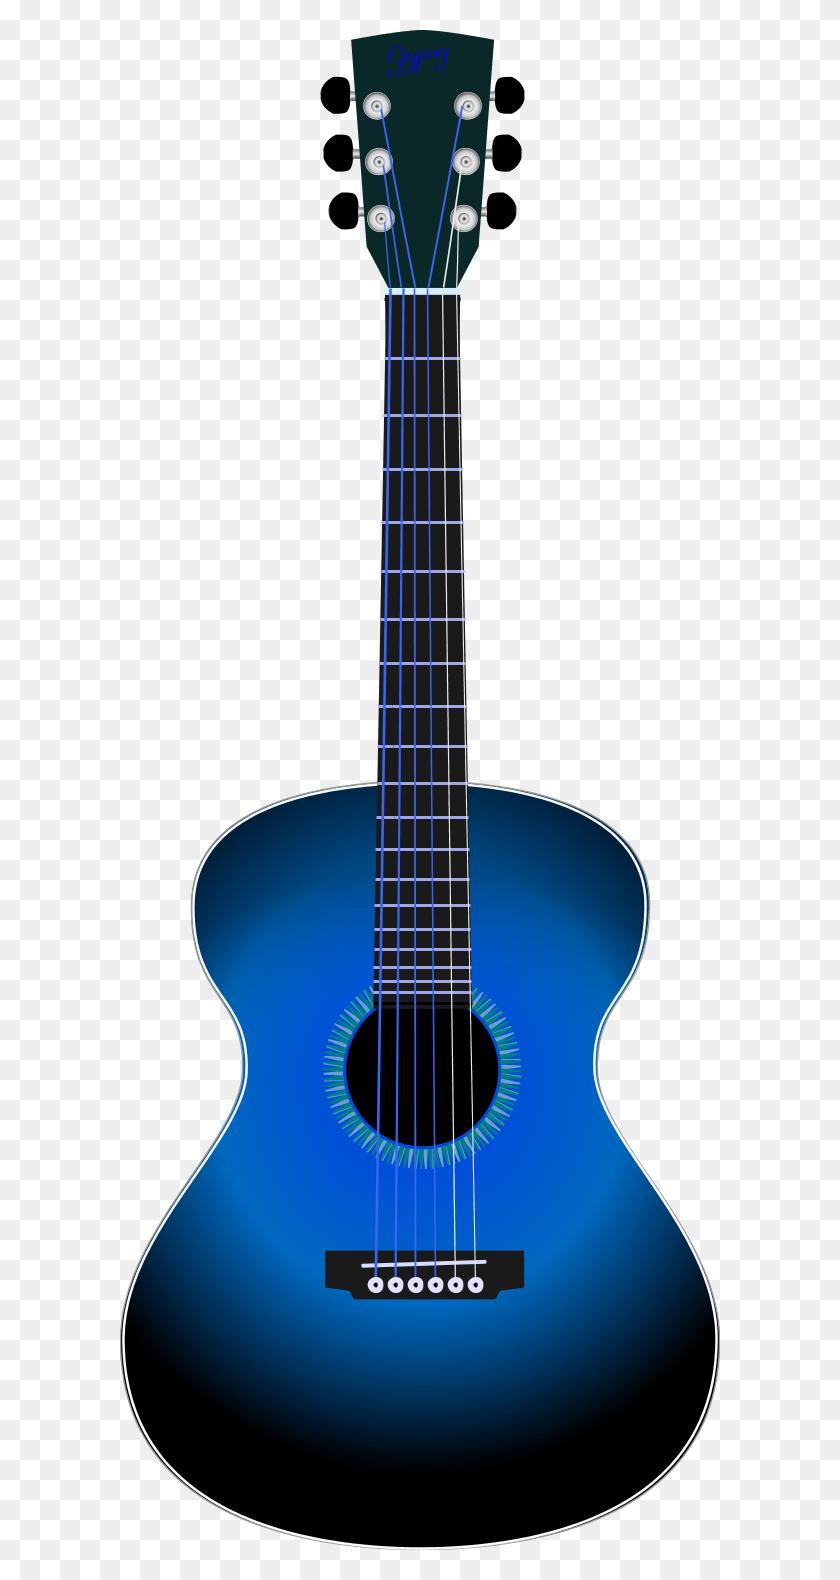 Acoustic Guitar Clipart - Acoustic Guitar Clipart